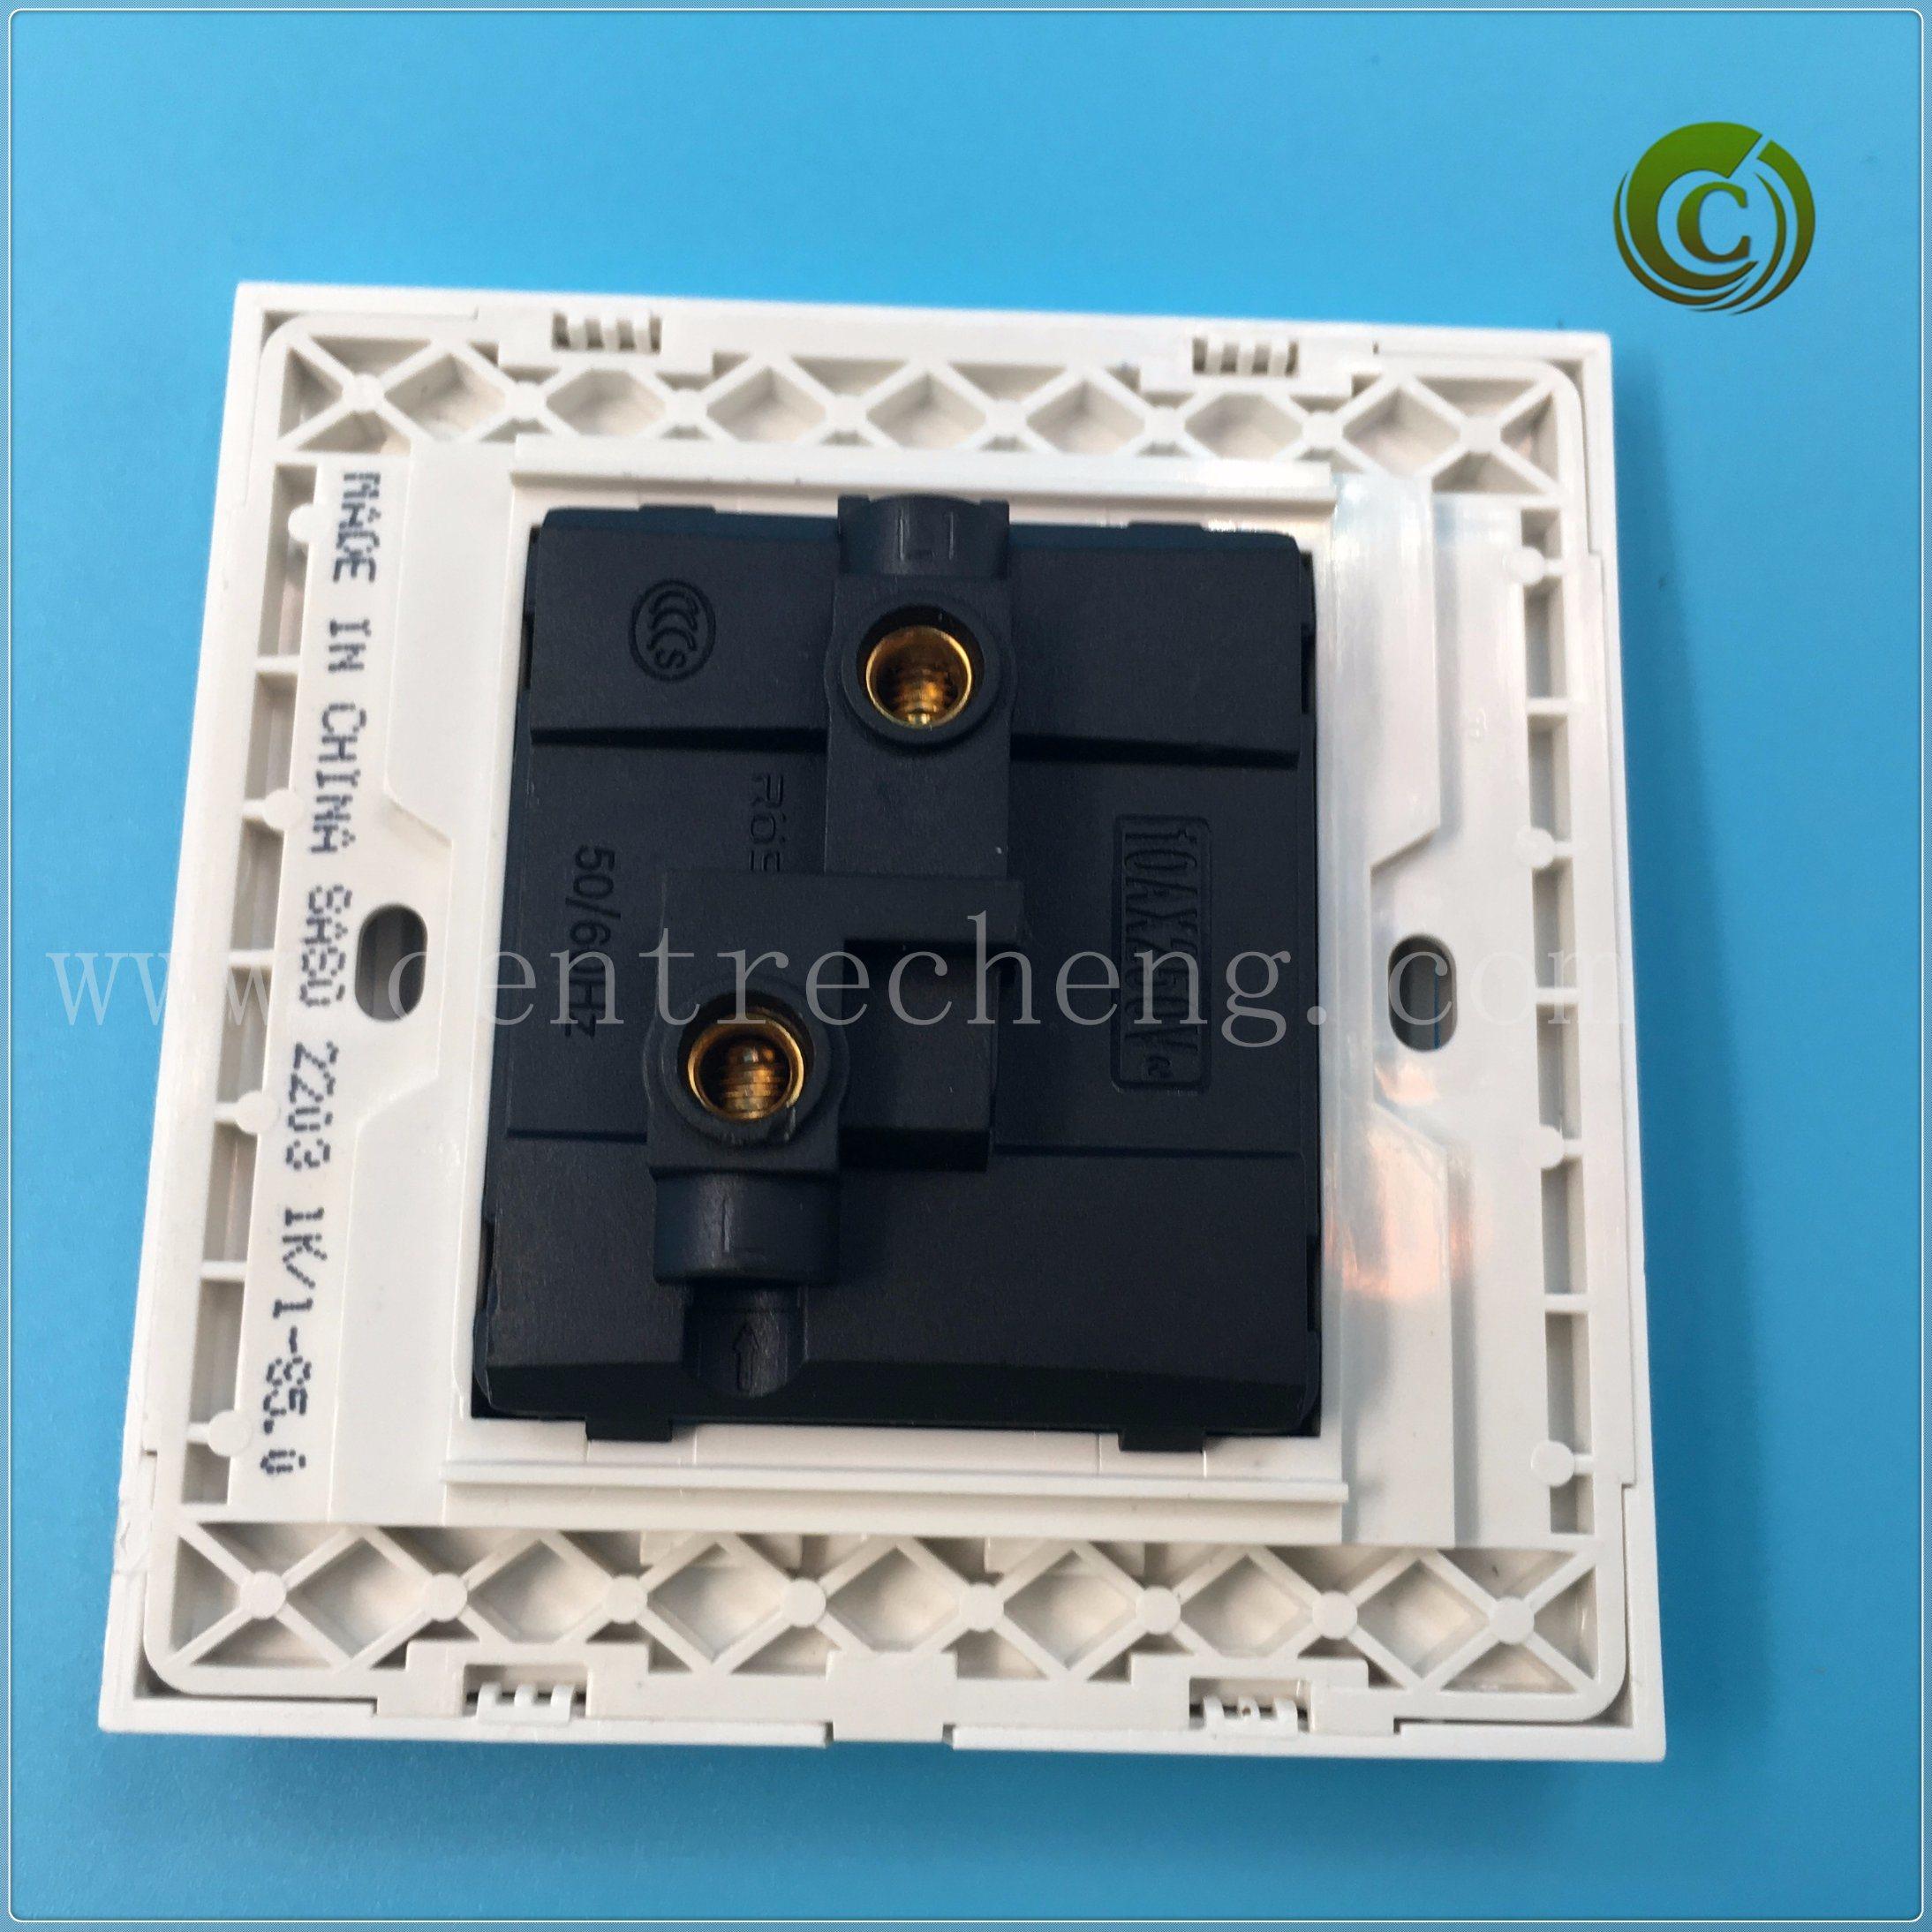 China 2018 Foshan 2 Gang Way Big Plate Switch Electrical Light Wall